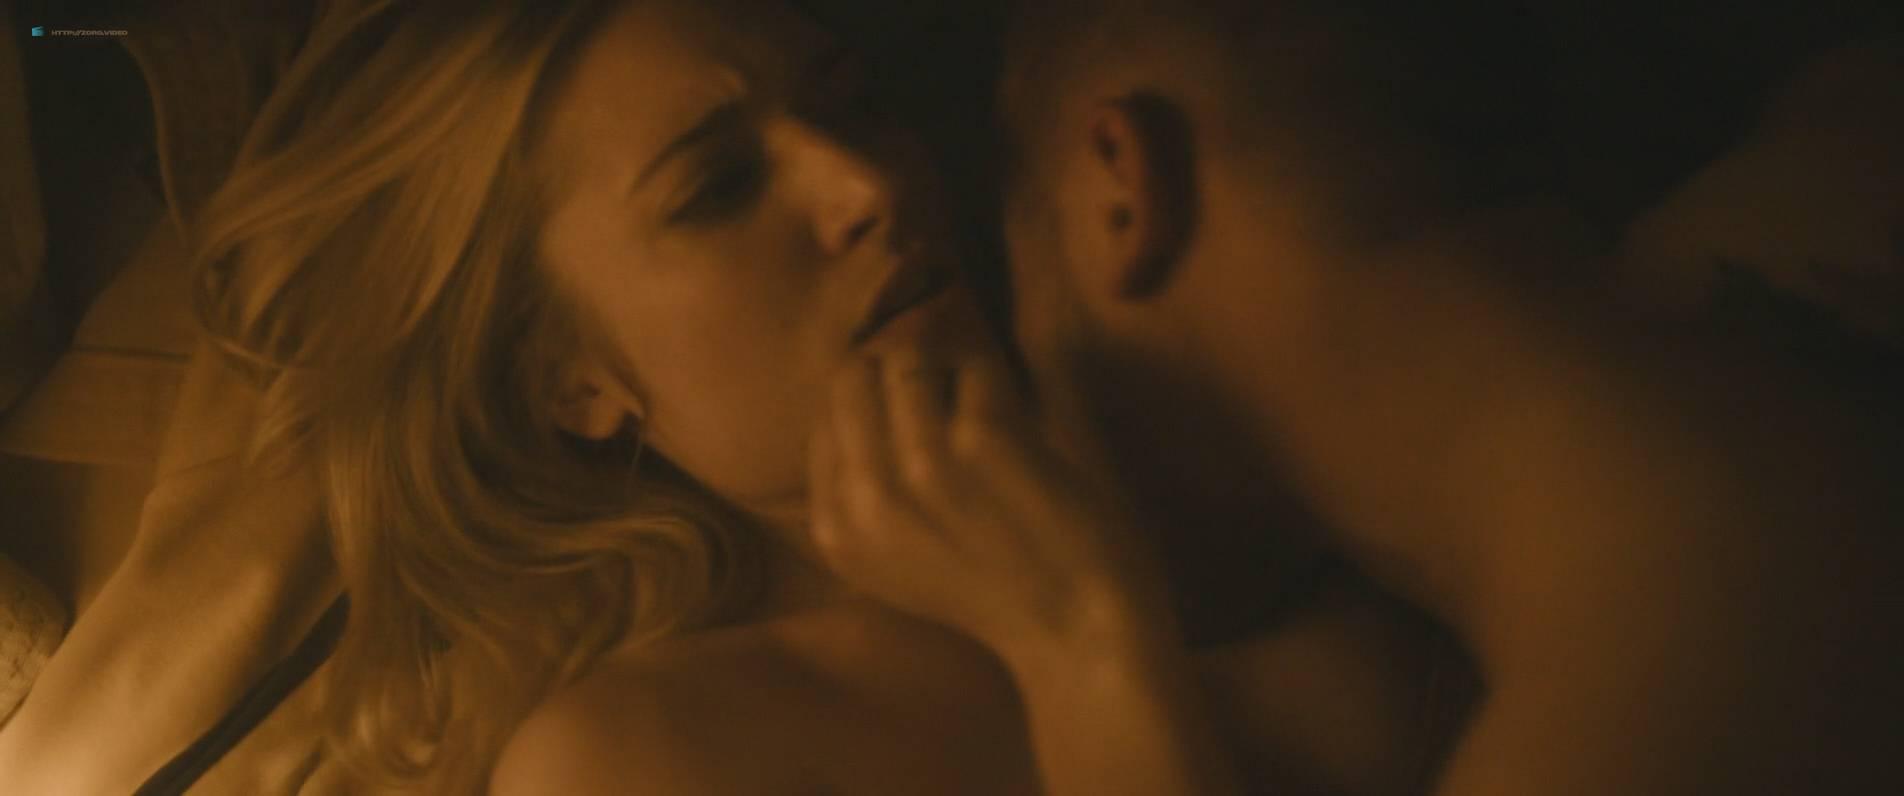 Ksenia Solo Nude Topløs Jenna Kramer Nude Andre Hoy And Nude - jagten på Fellini 2017 Hd-2865